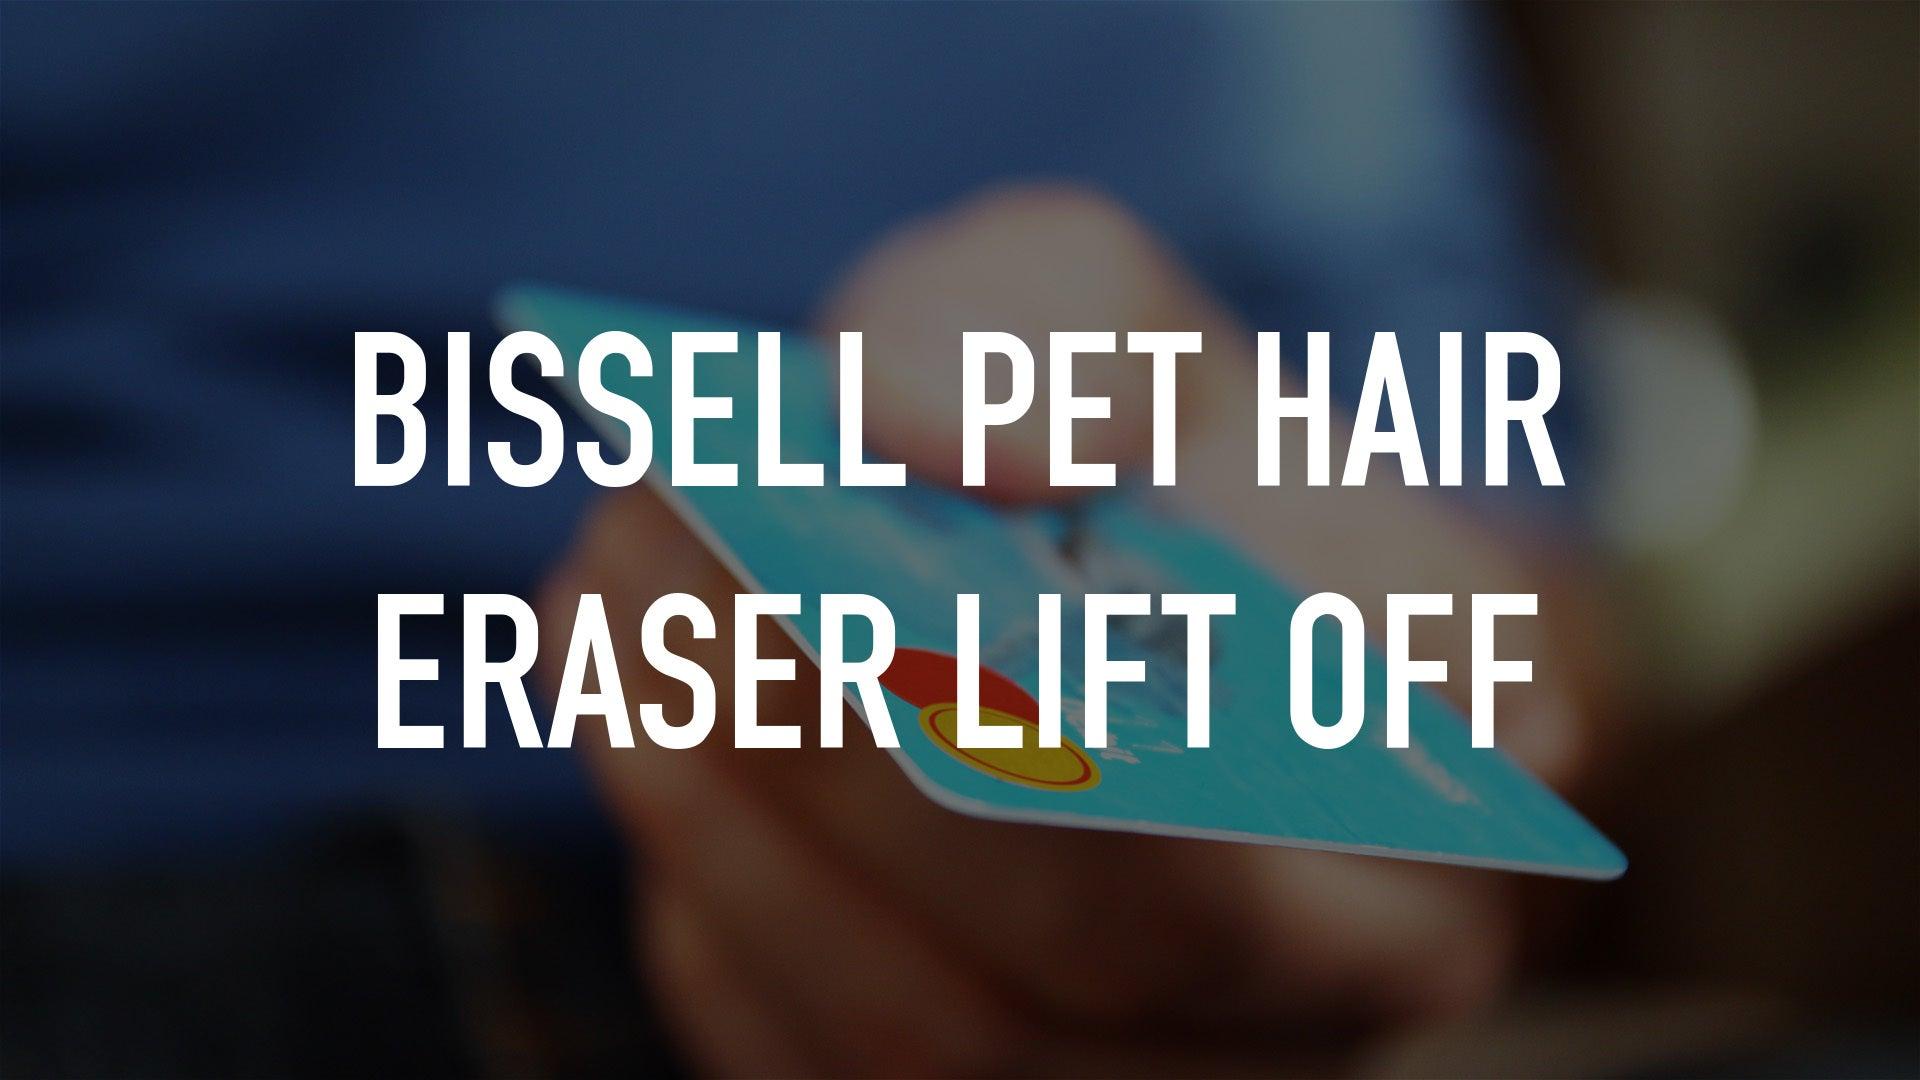 BISSELL Pet Hair Eraser Lift Off